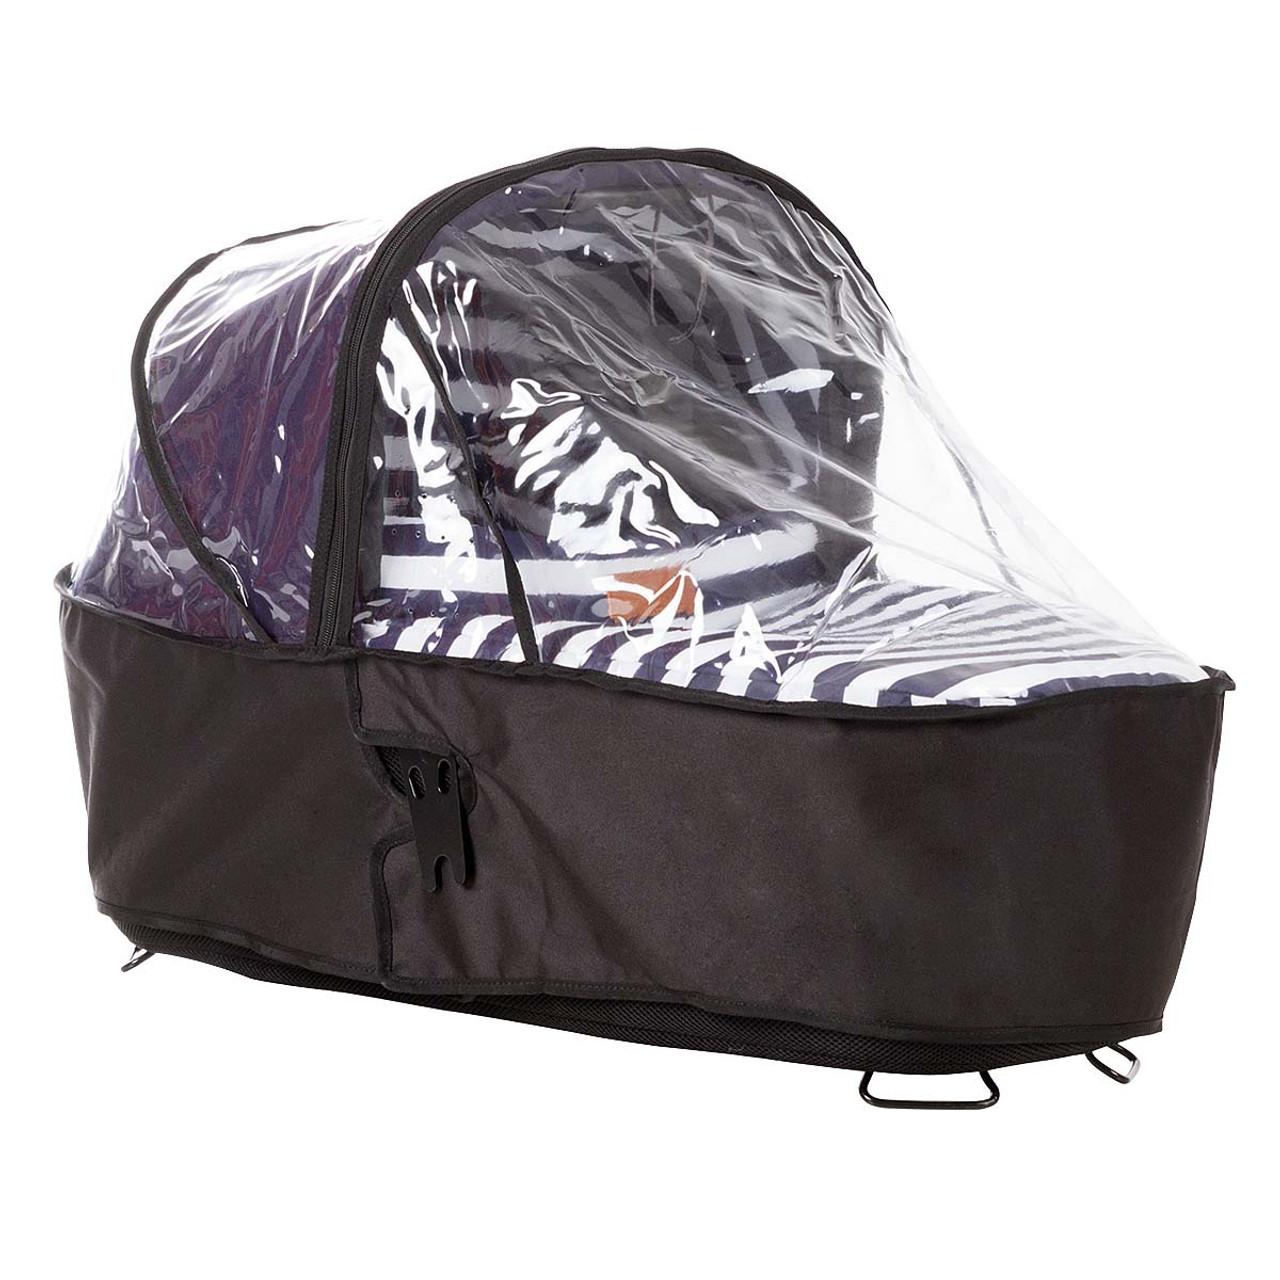 Mountain Buggy Rain Cover for Carrycot Plus fits Swift / Mini / Urban Jungle / Terrain / +One